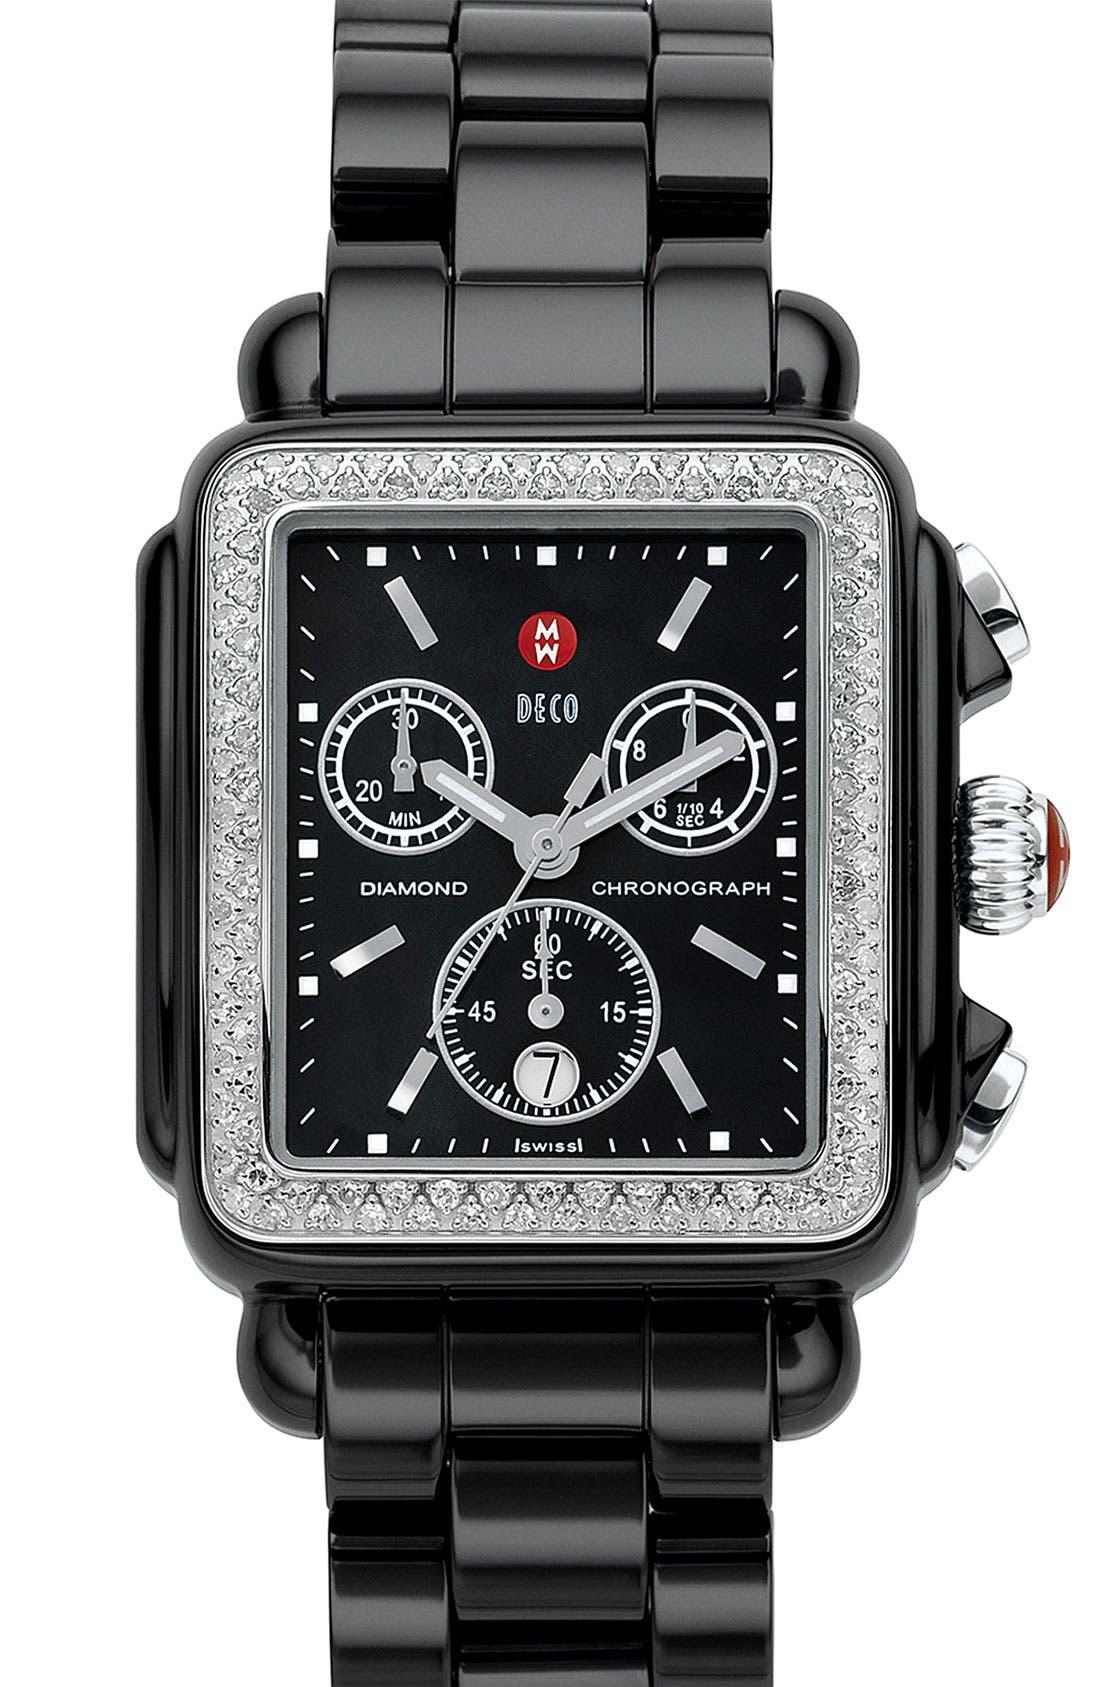 Alternate Image 1 Selected - MICHELE 'Deco Diamond' Ceramic Bracelet Watch, 33mm x 46mm